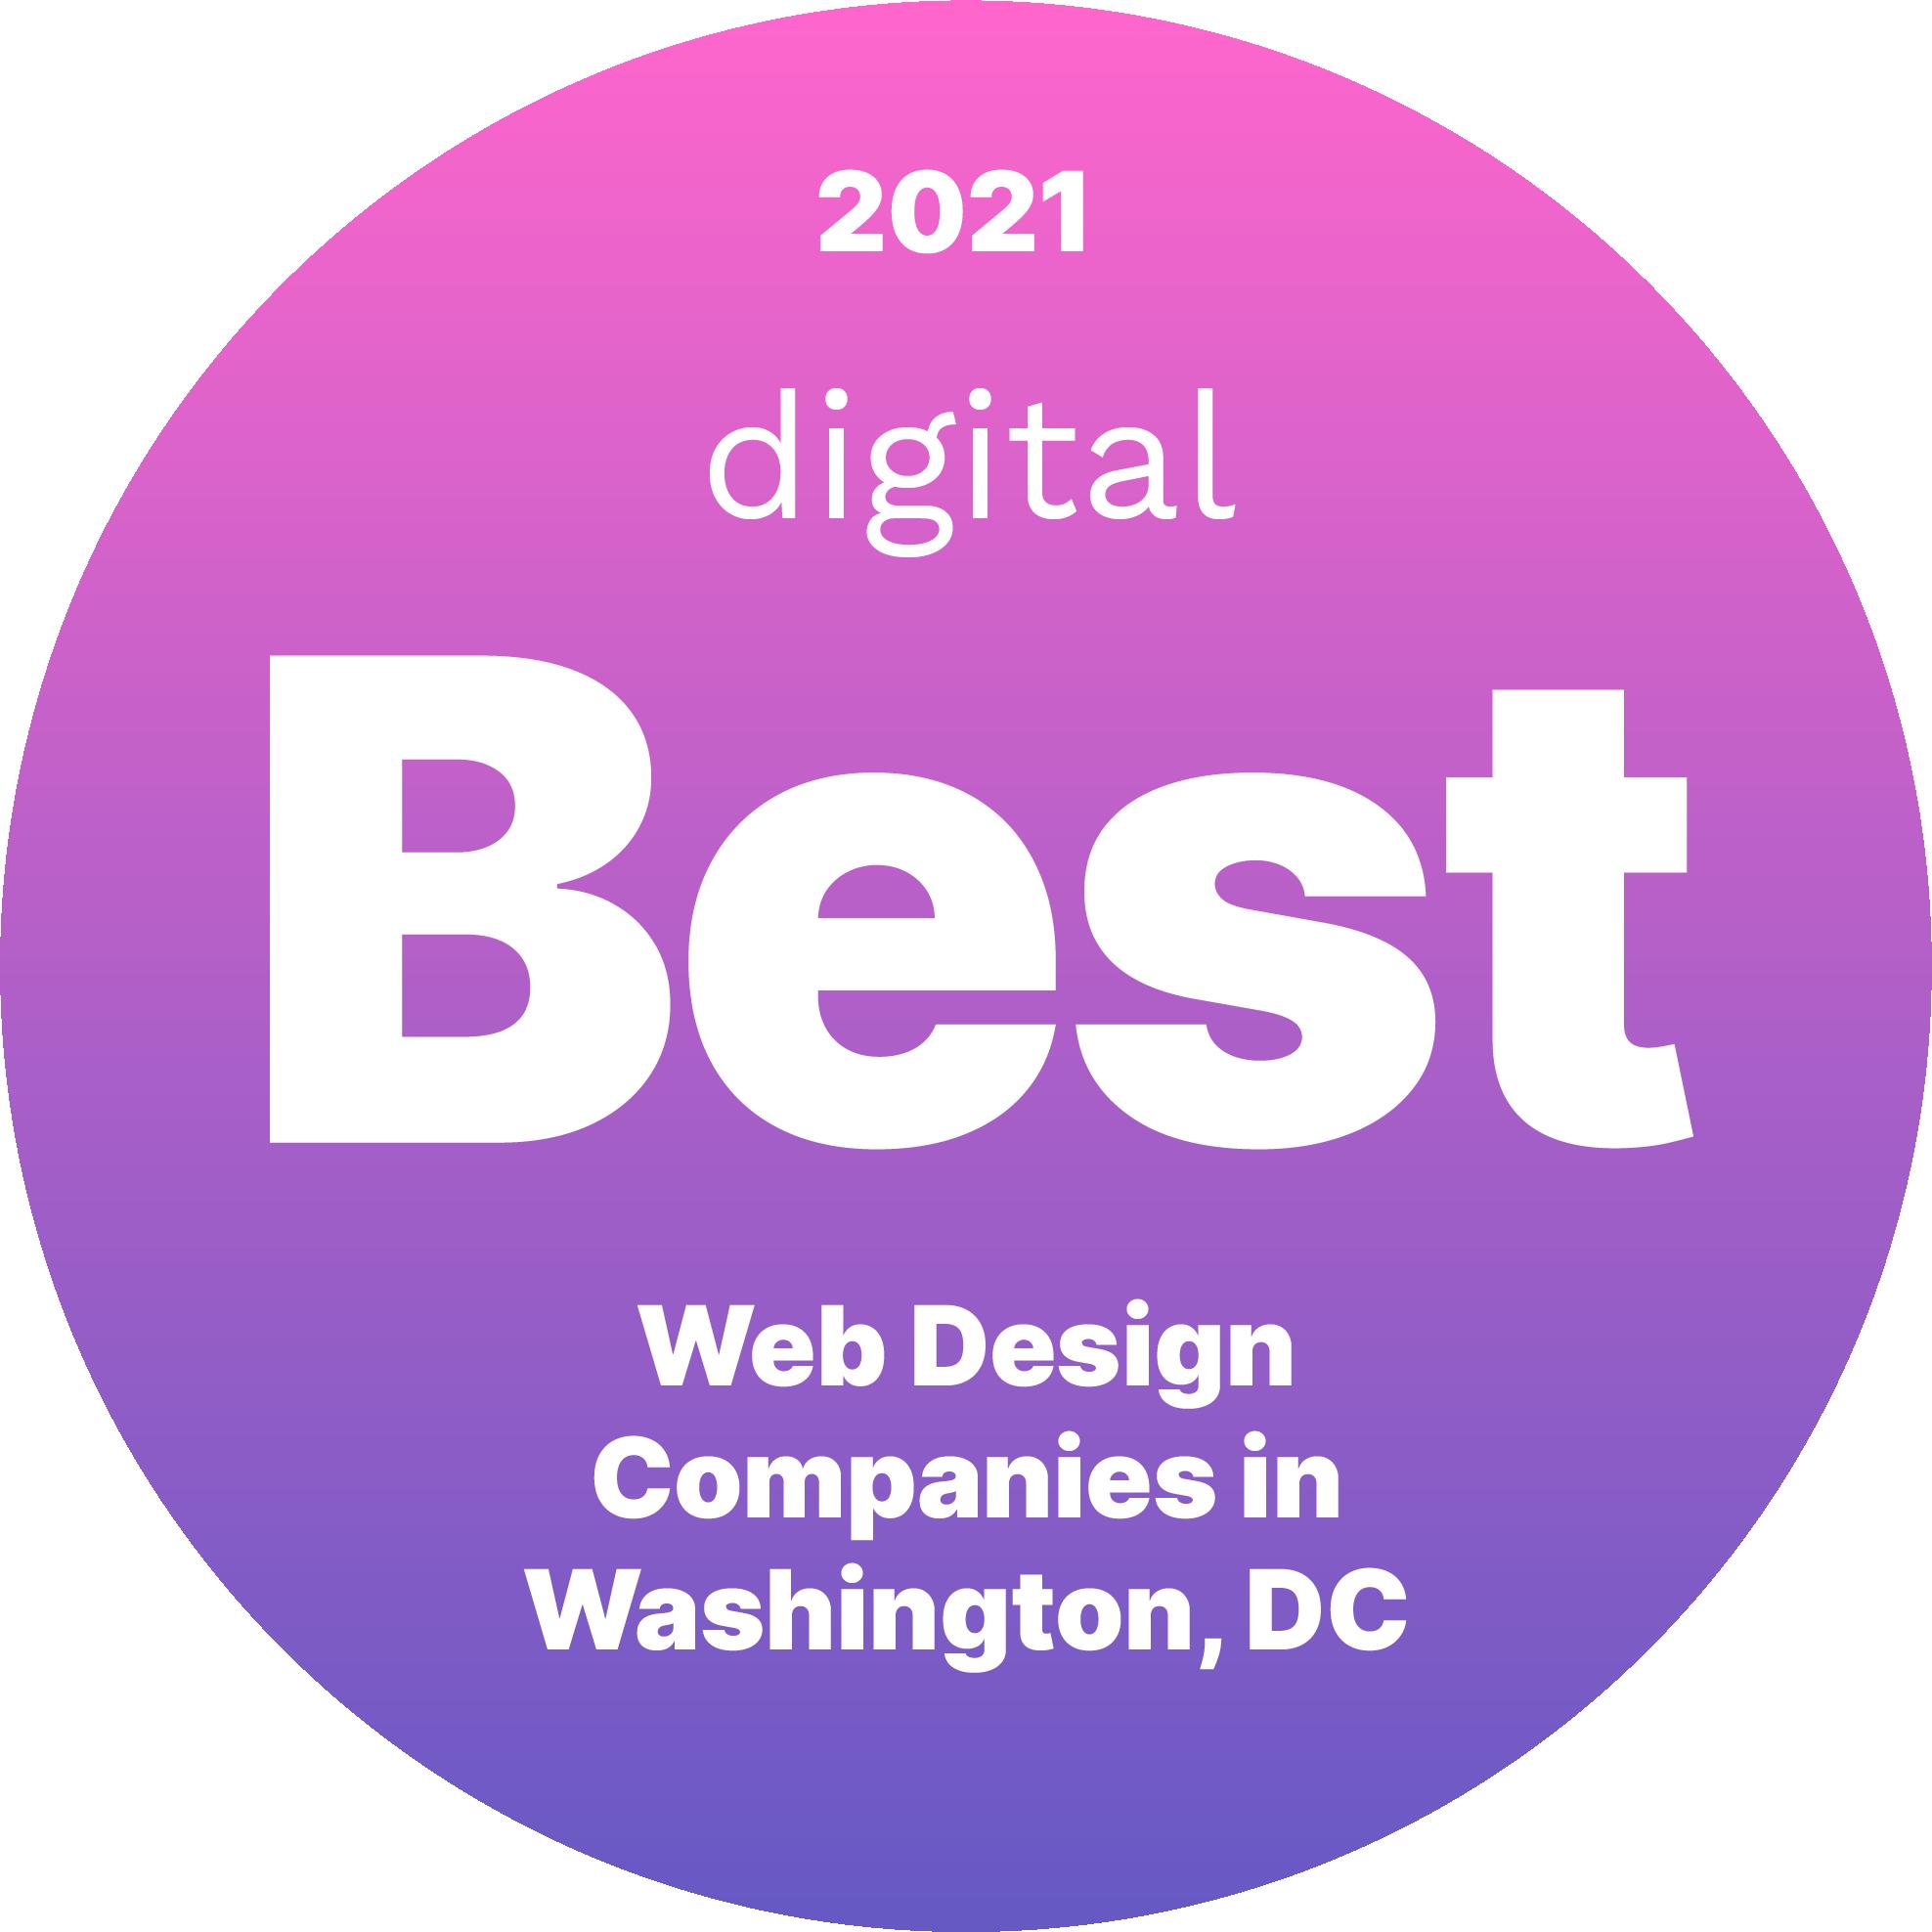 Web Design Companies in Washington DC